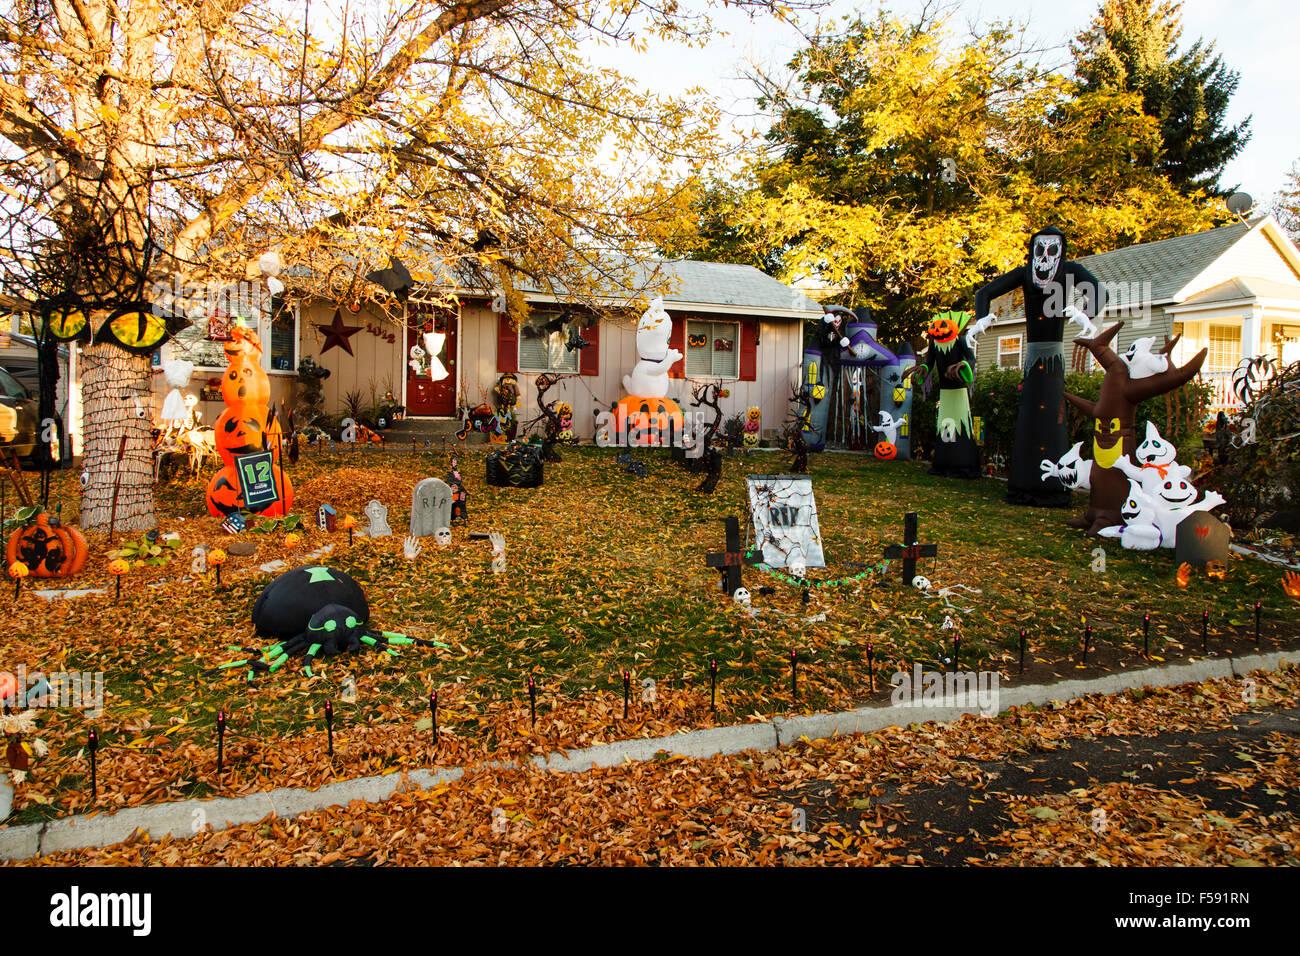 Getting Ready For Halloween, Prosser WA USA